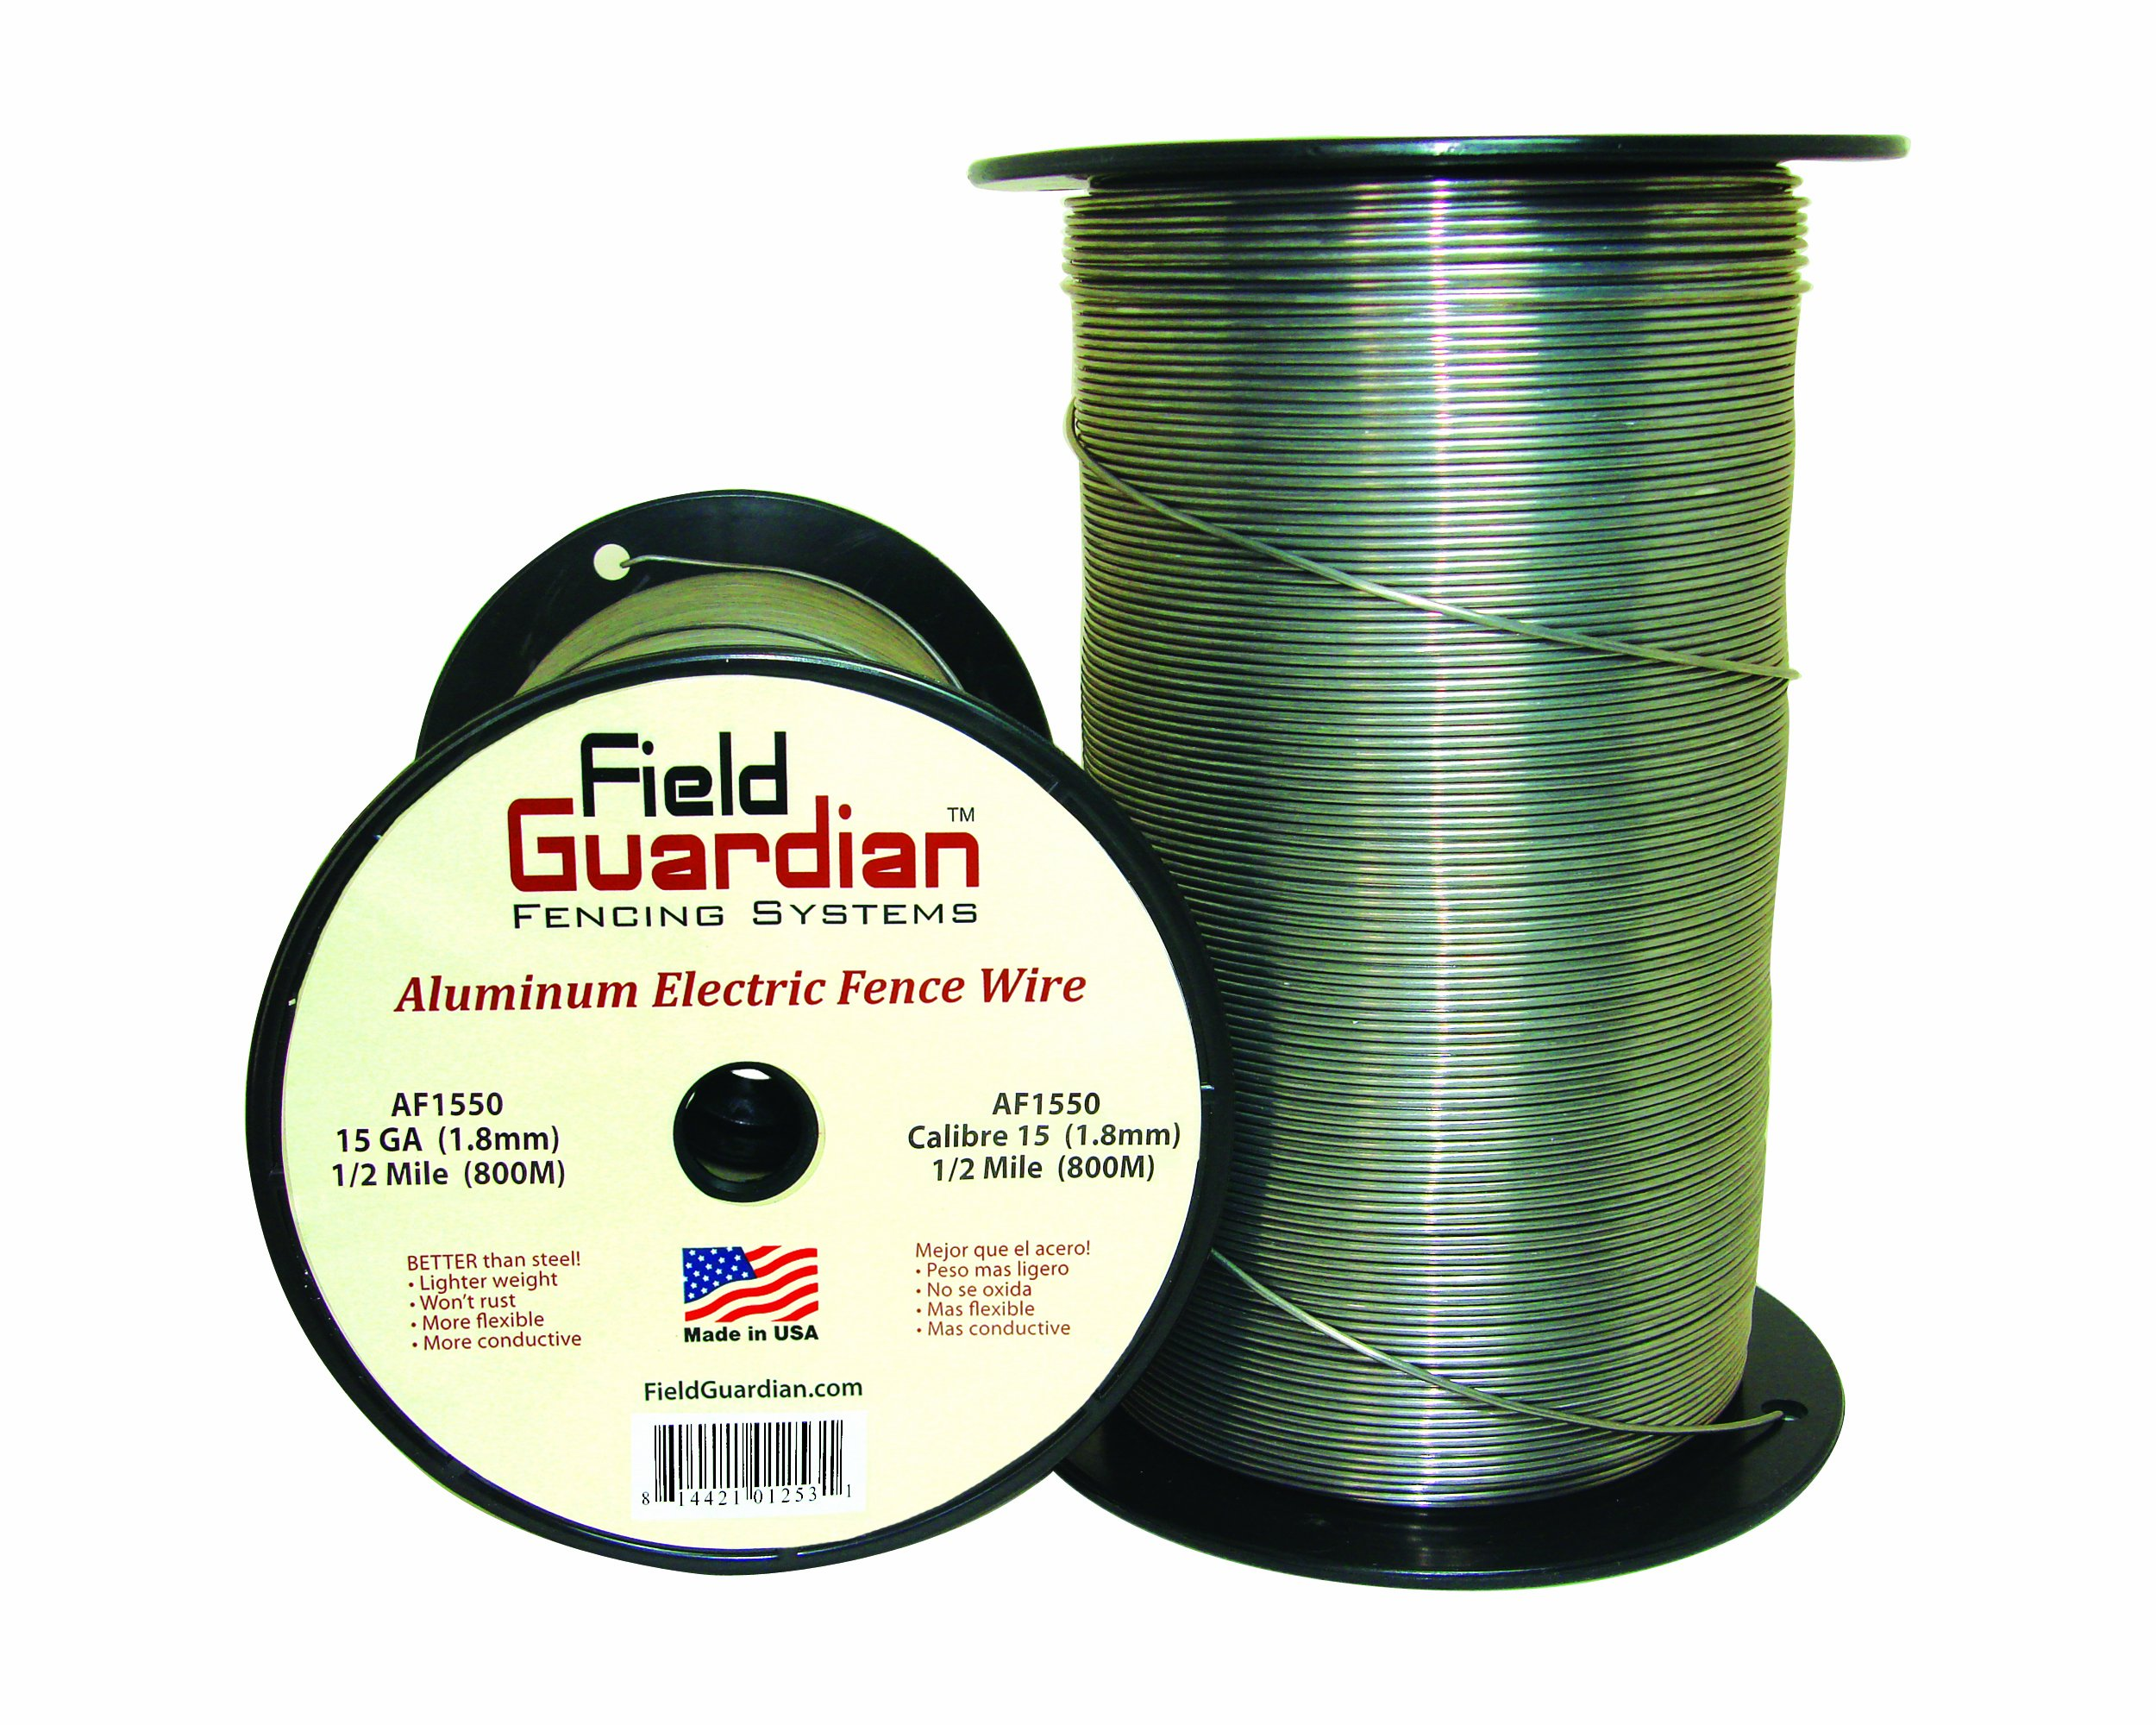 Field Guardian 15-Guage Aluminum Wire, 1/2 Miles